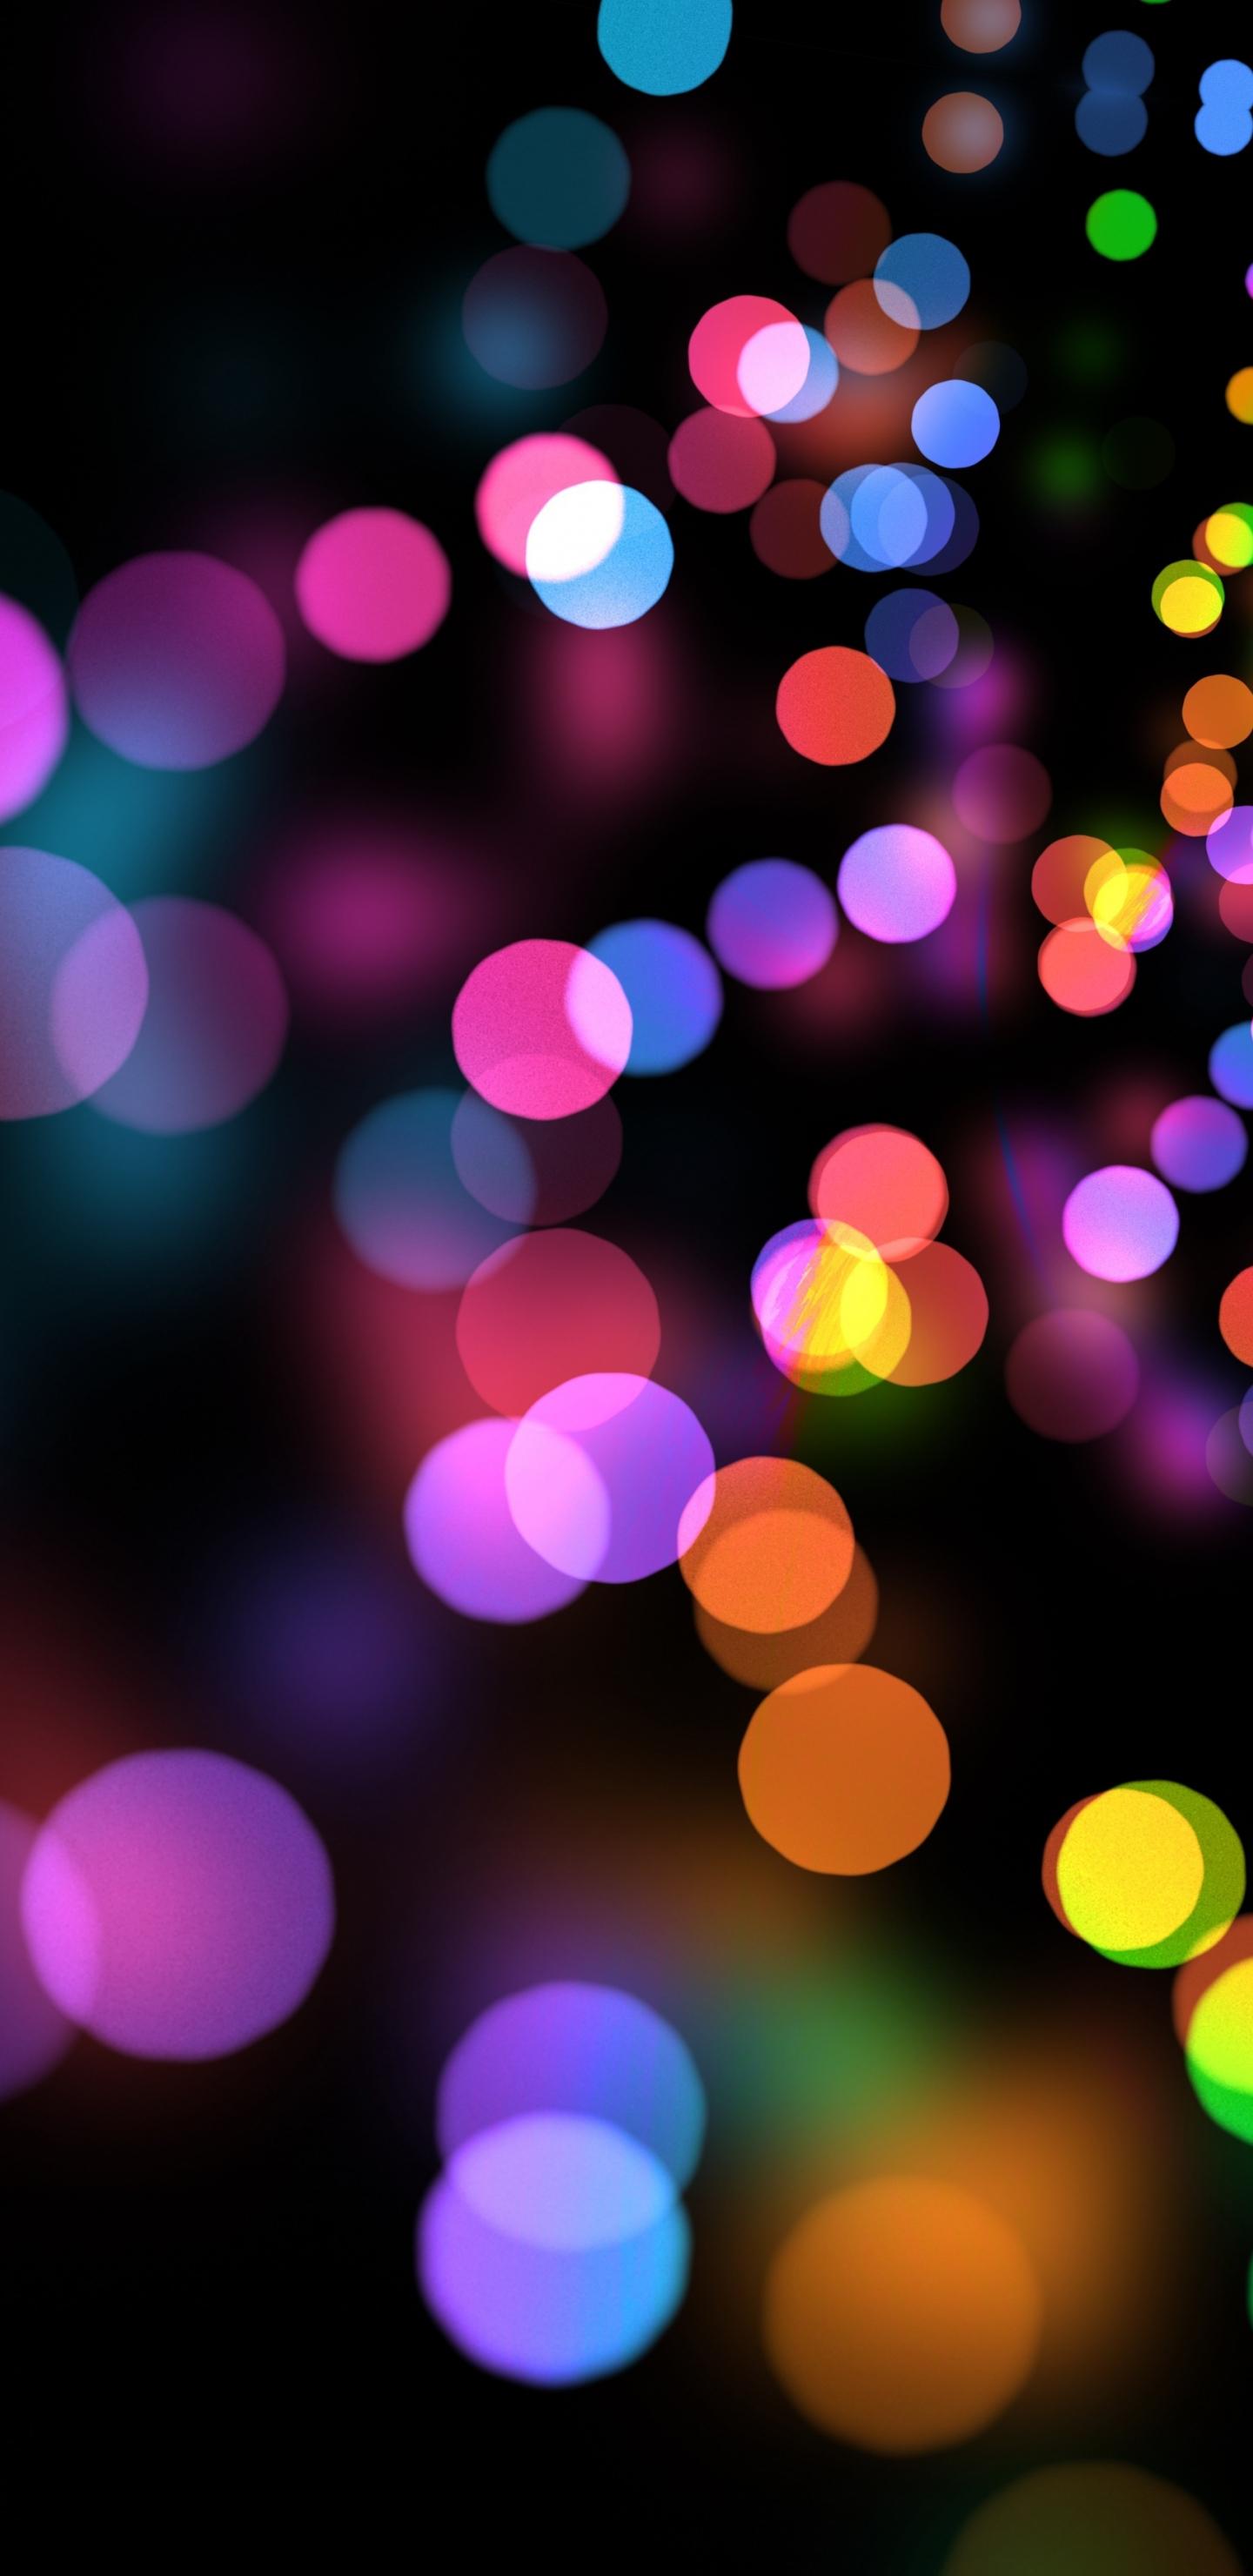 Party Lights Circles Colorful Bokeh 1440x2960 Wallpaper